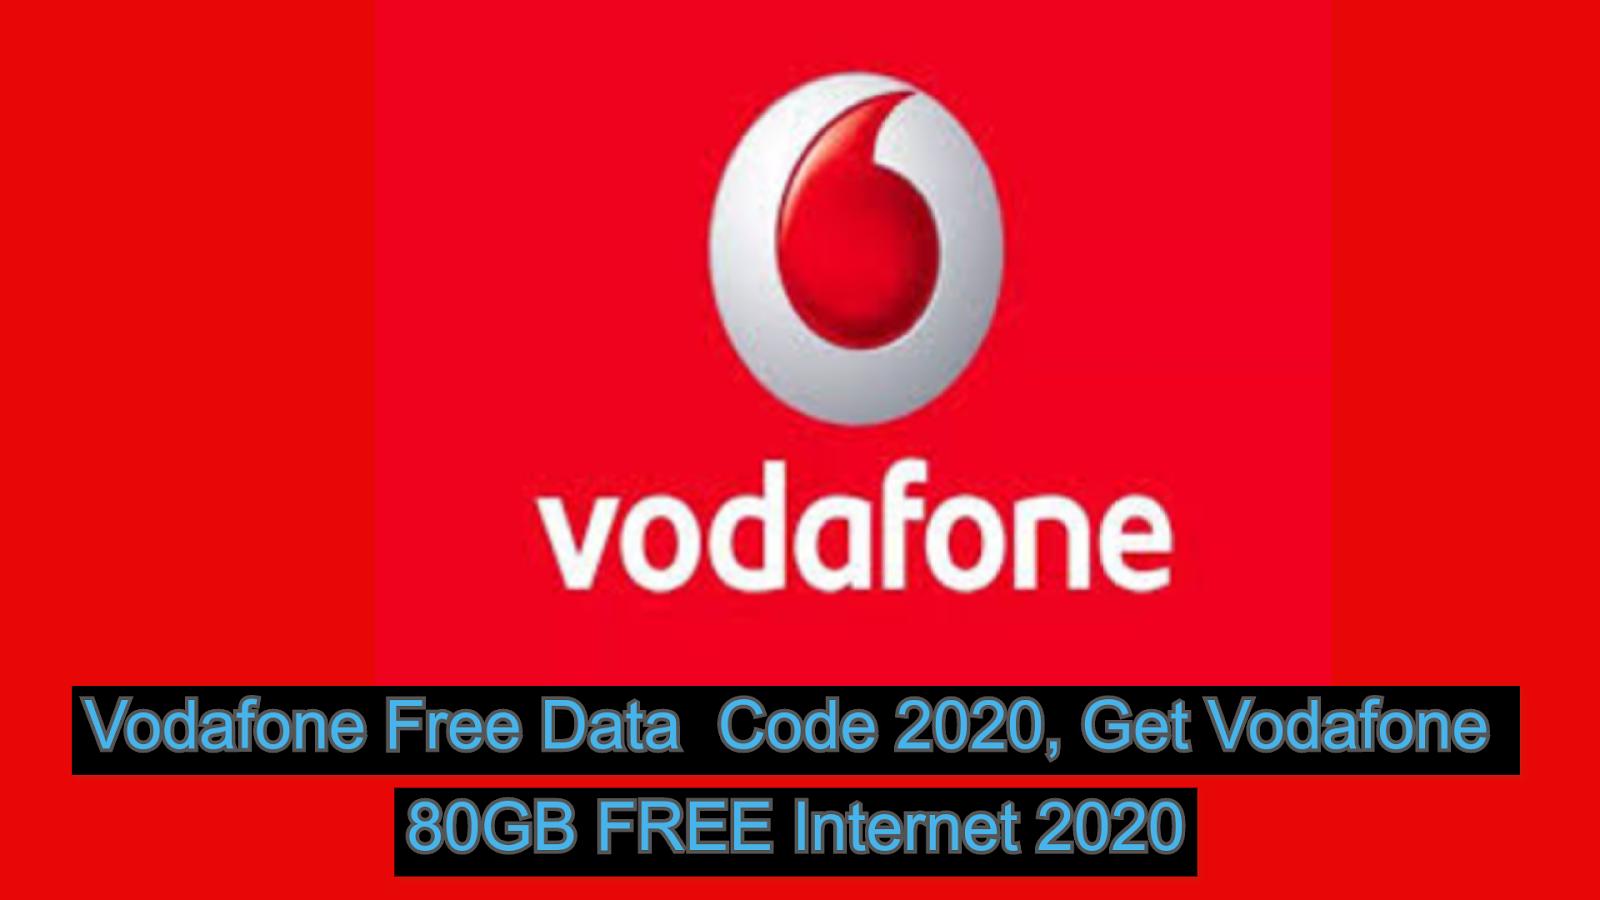 Vodafone Free Data Code 2020 Get Vodafone 80gb Free Internet 2020